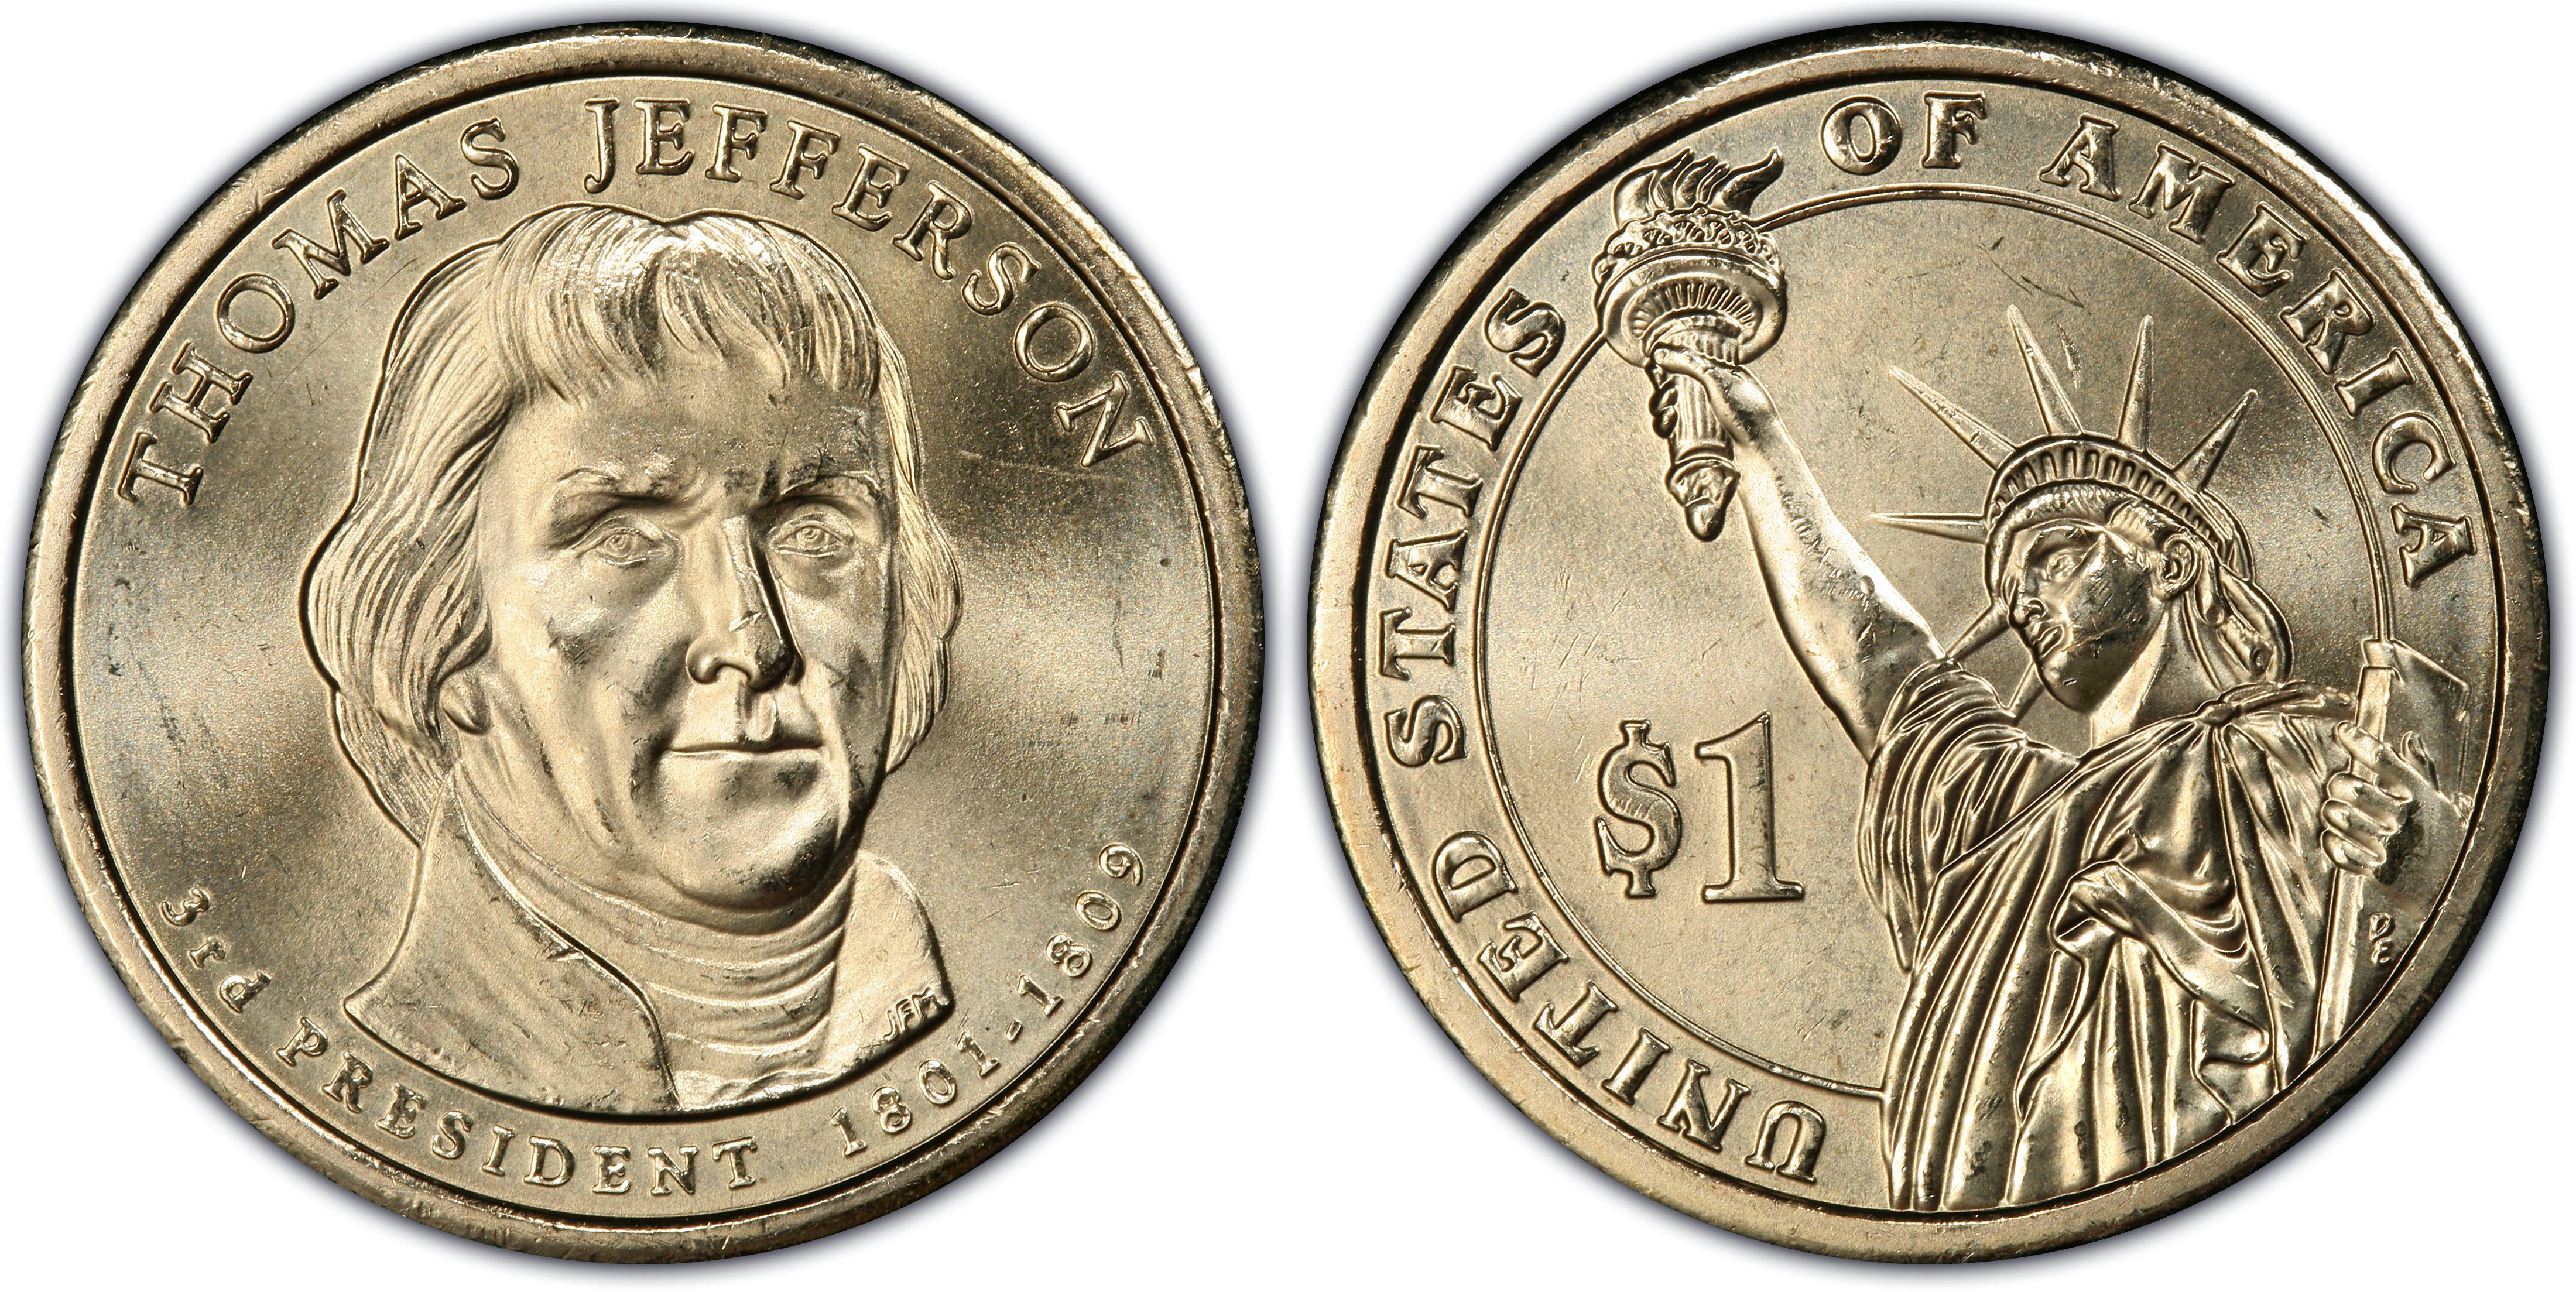 jefferson coin